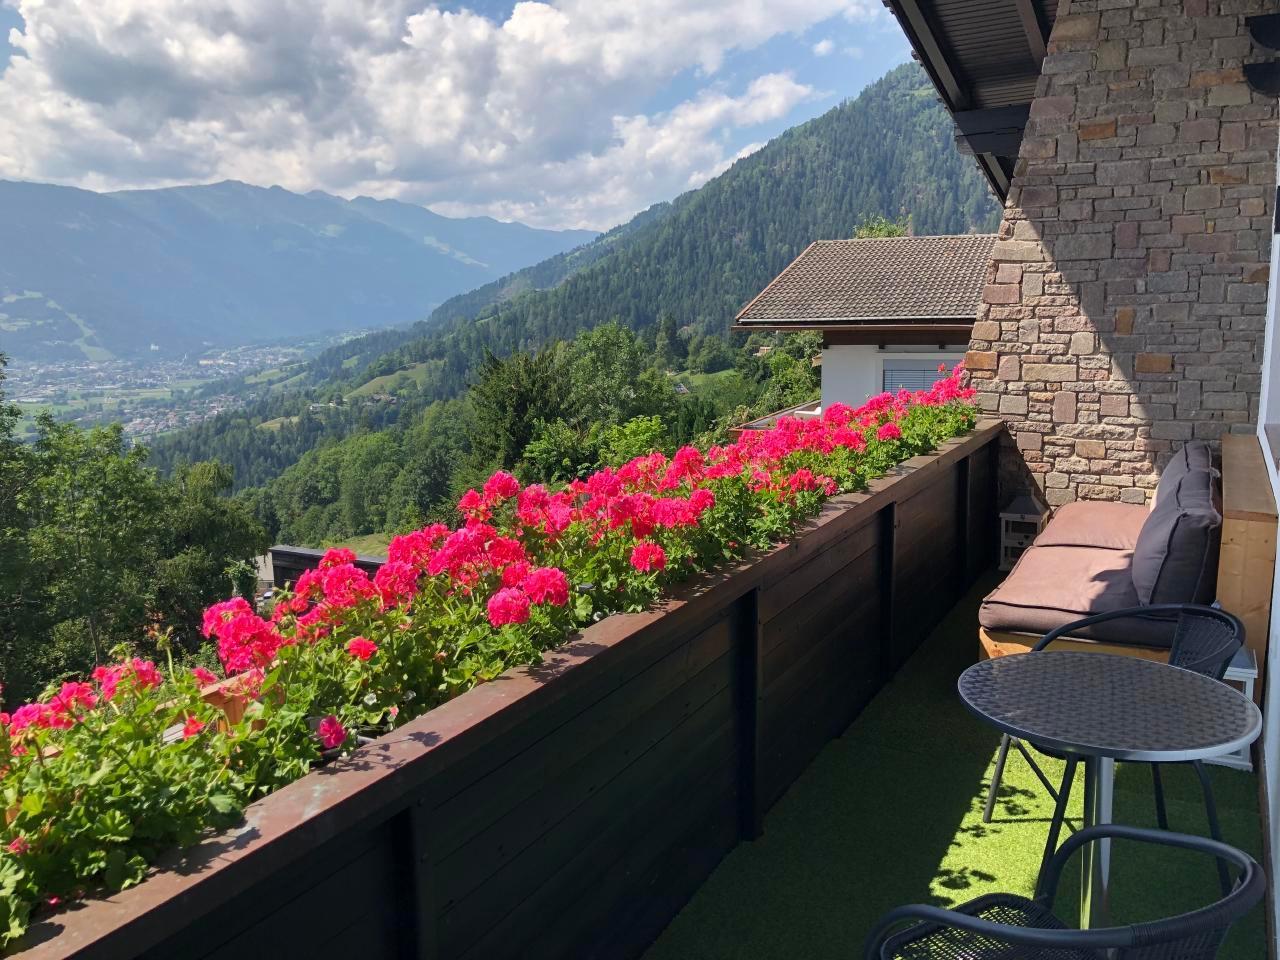 Maison de vacances Landhaus Osttirol (2299545), Dölsach, Osttirol, Tyrol, Autriche, image 40